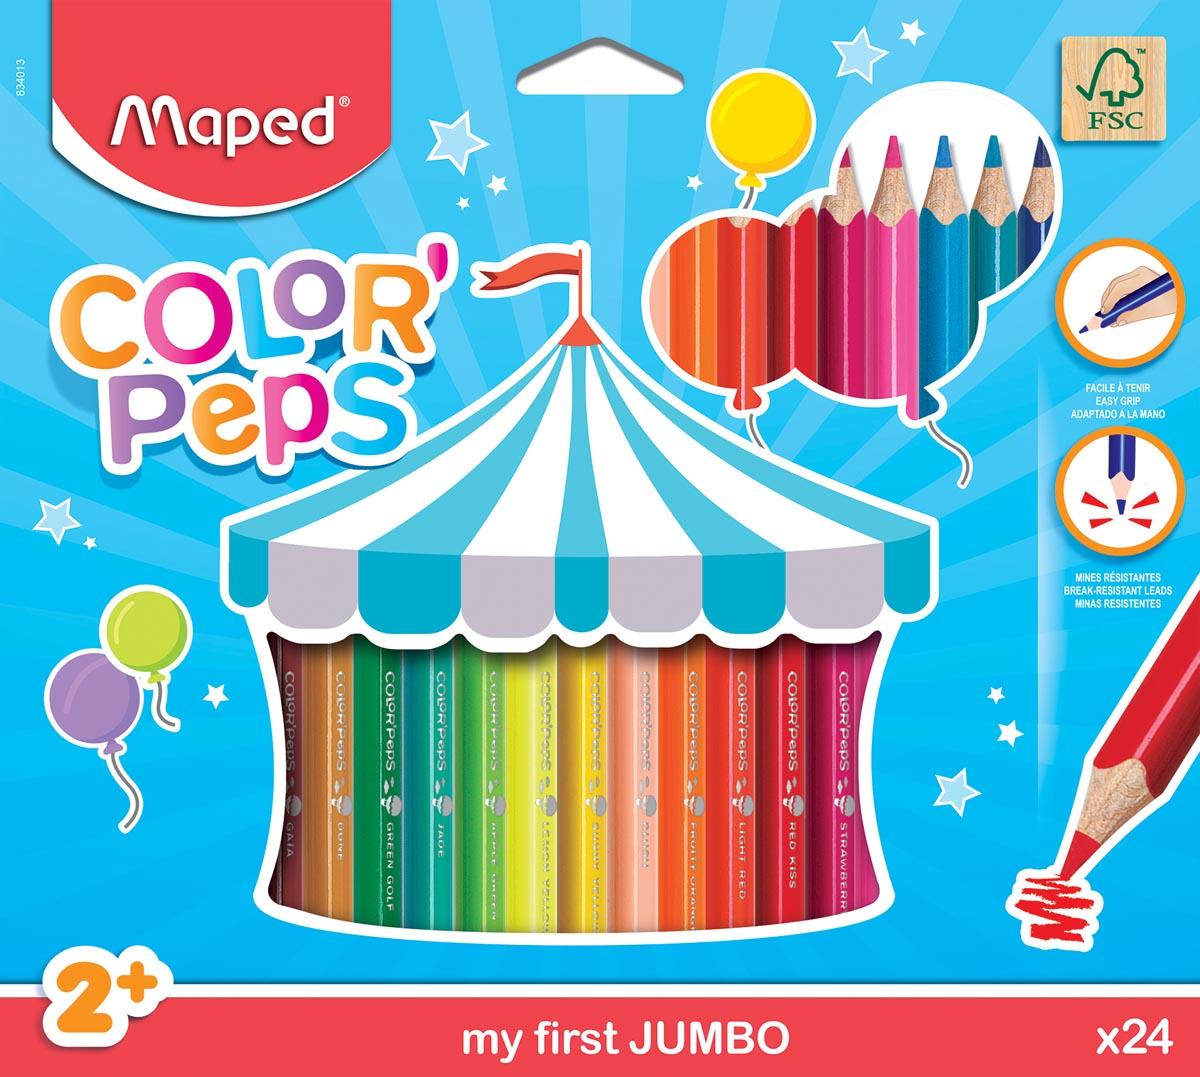 Maped kleurpotlood Color'Peps Jumbo Early Age, 24 potloden in een kartonnen etui